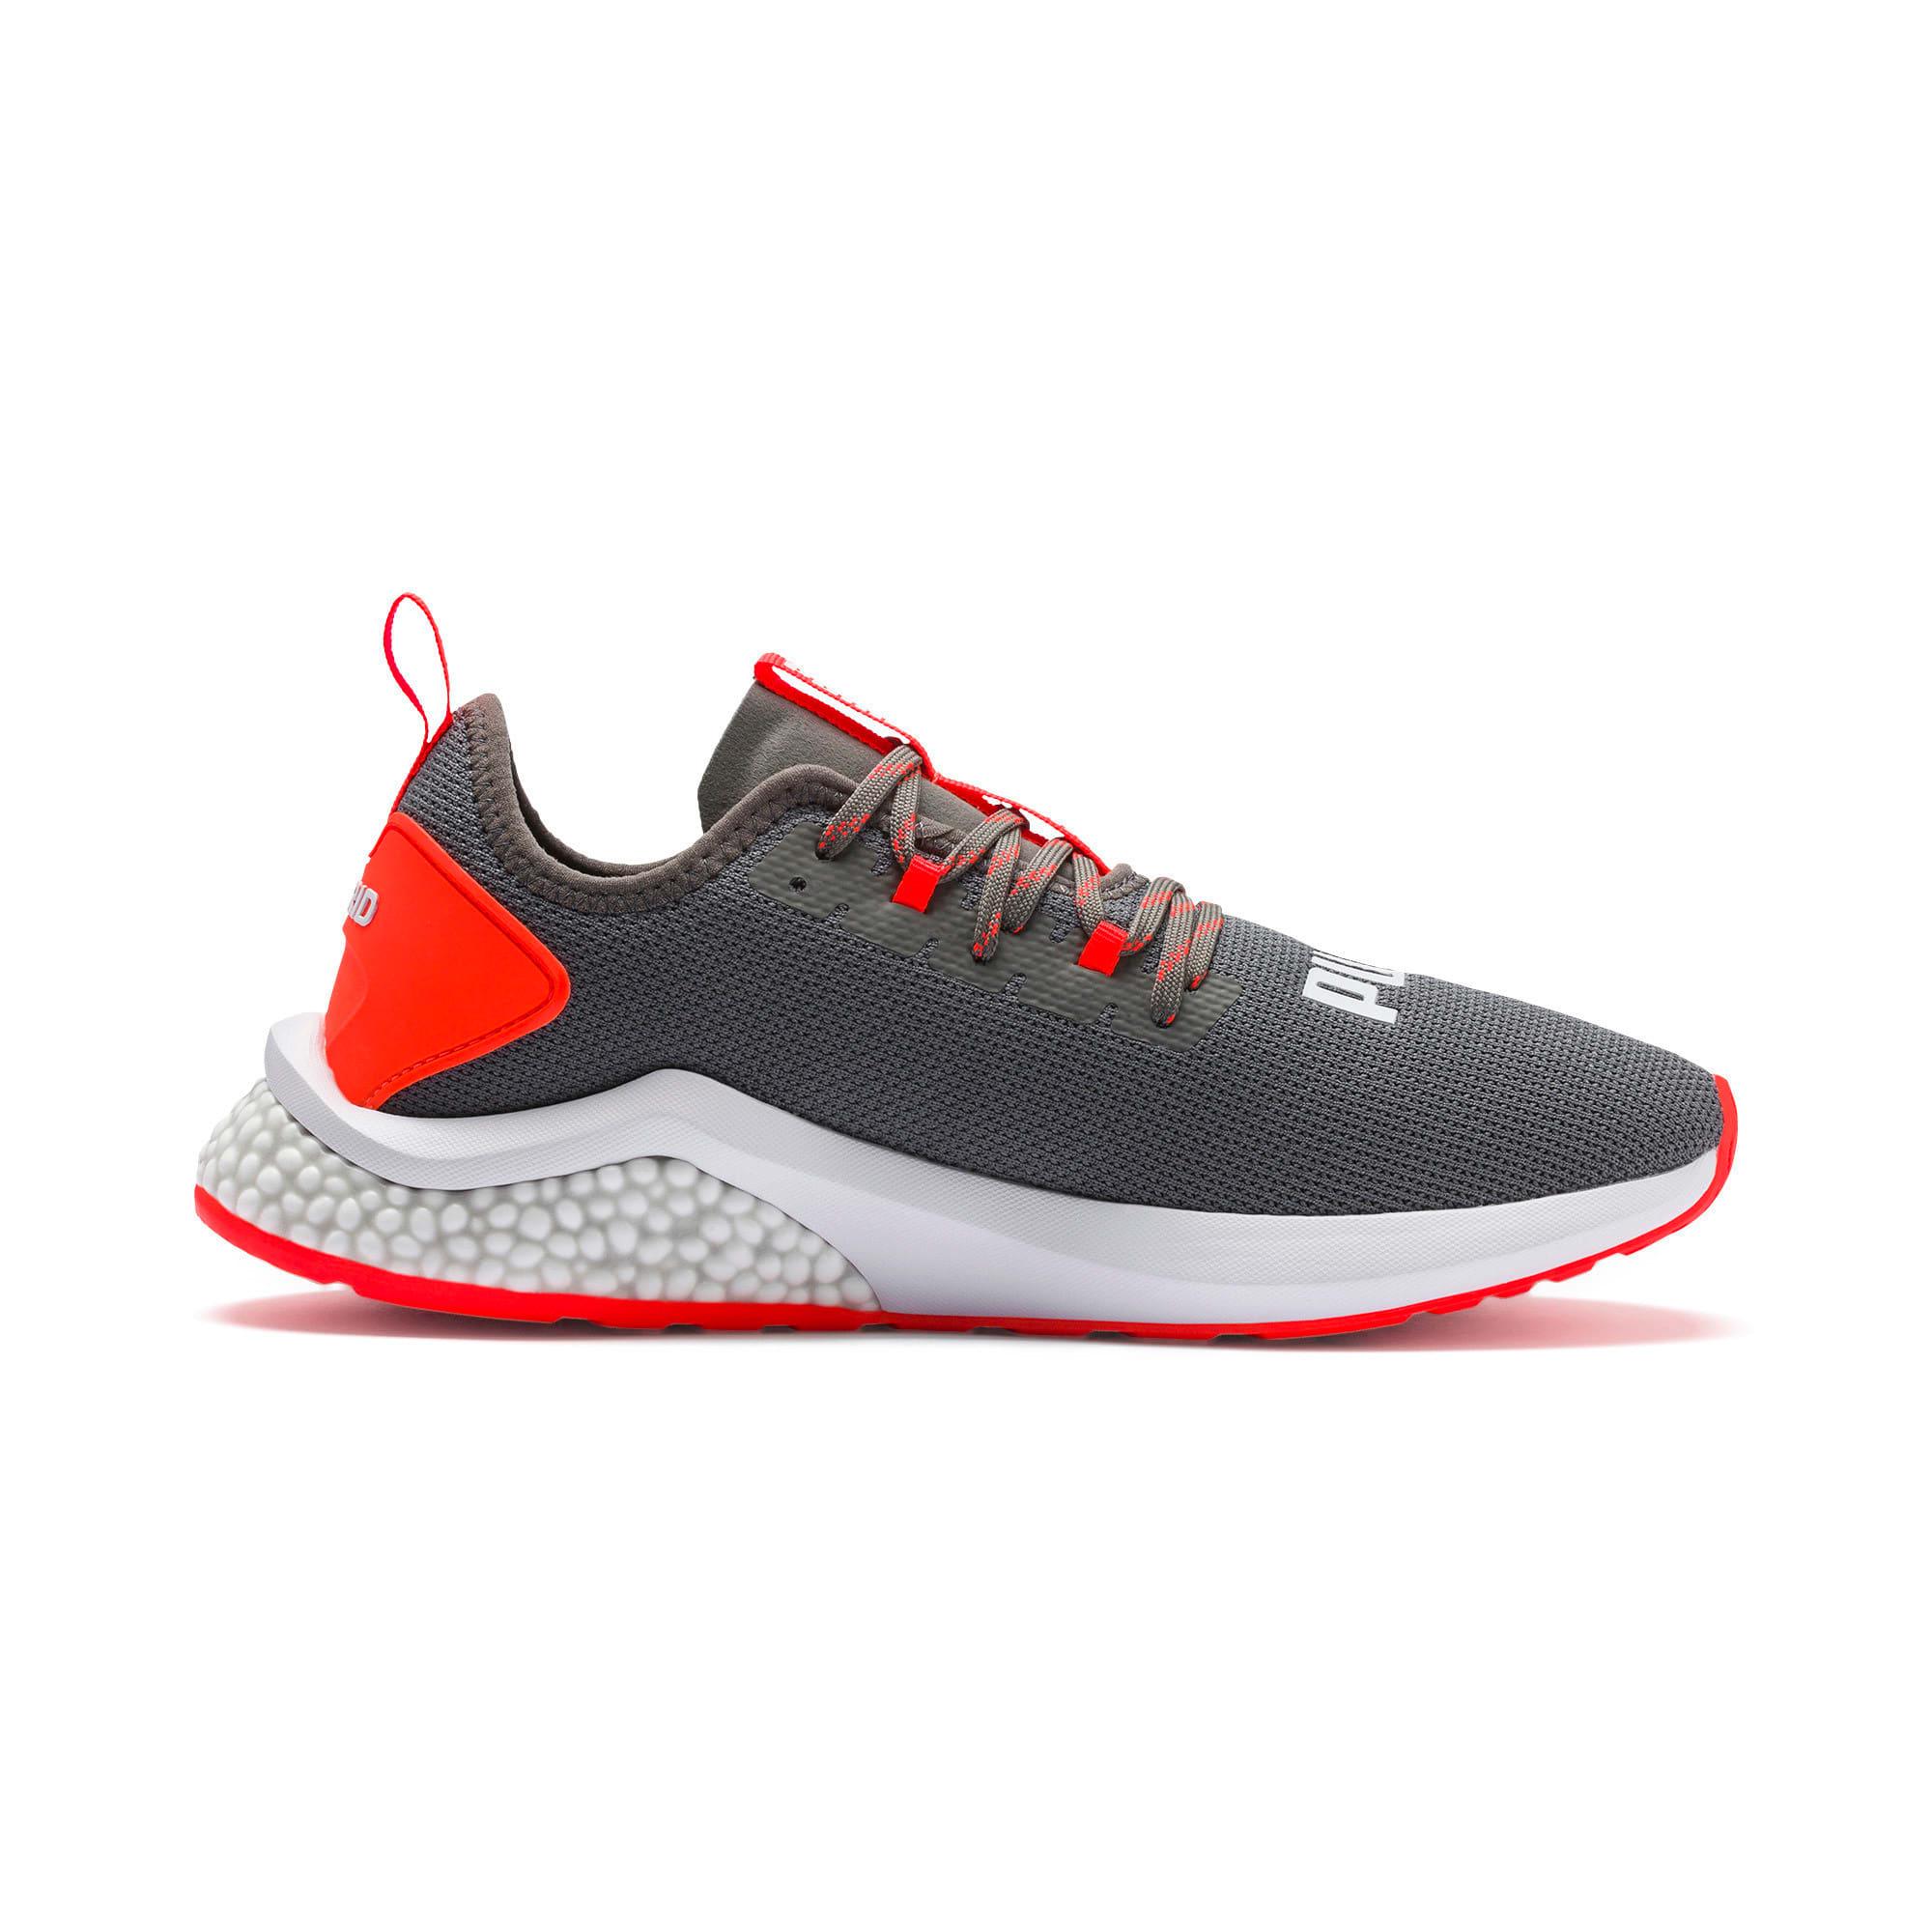 Thumbnail 6 of HYBRID NX Men's Running Shoes, CASTLEROCK-Nrgy Red, medium